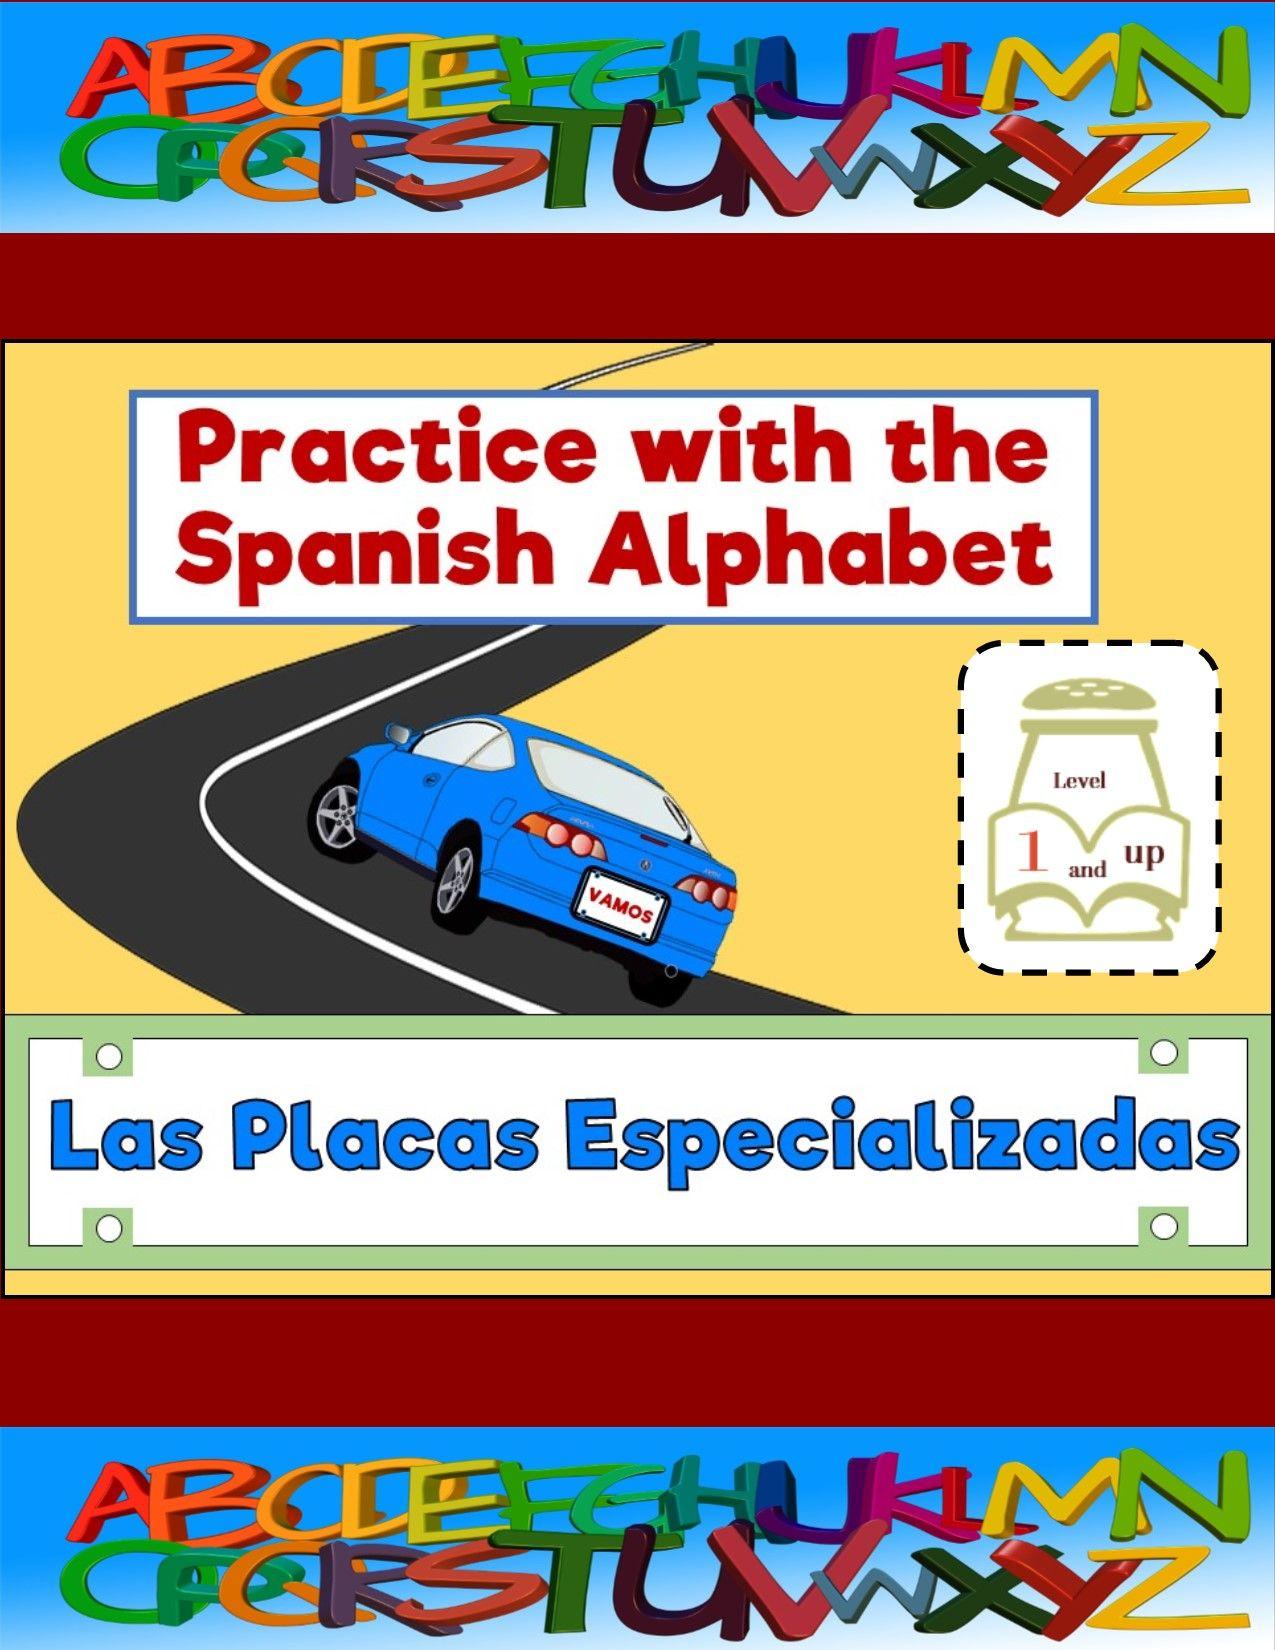 Spanish Alphabet Practice For Level 1 Las Placas